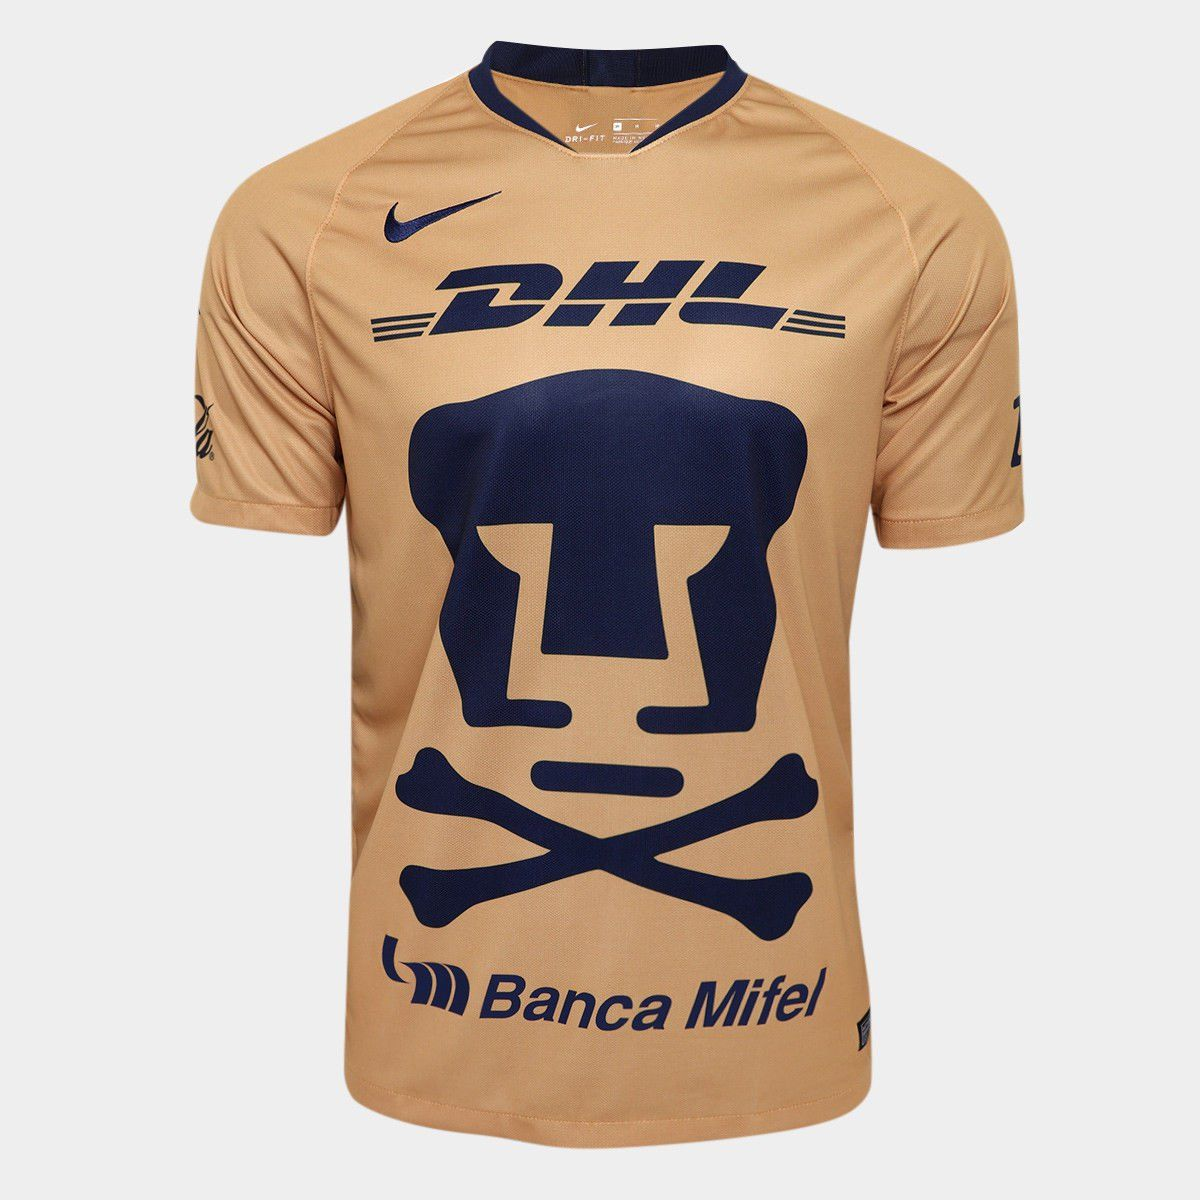 9d9243050 Pumas+UNAM+Futbol+Special+Edition+Jersey+2018/2019#swimwear #print  #tropical #summer #cool #manstyle #style #fashion